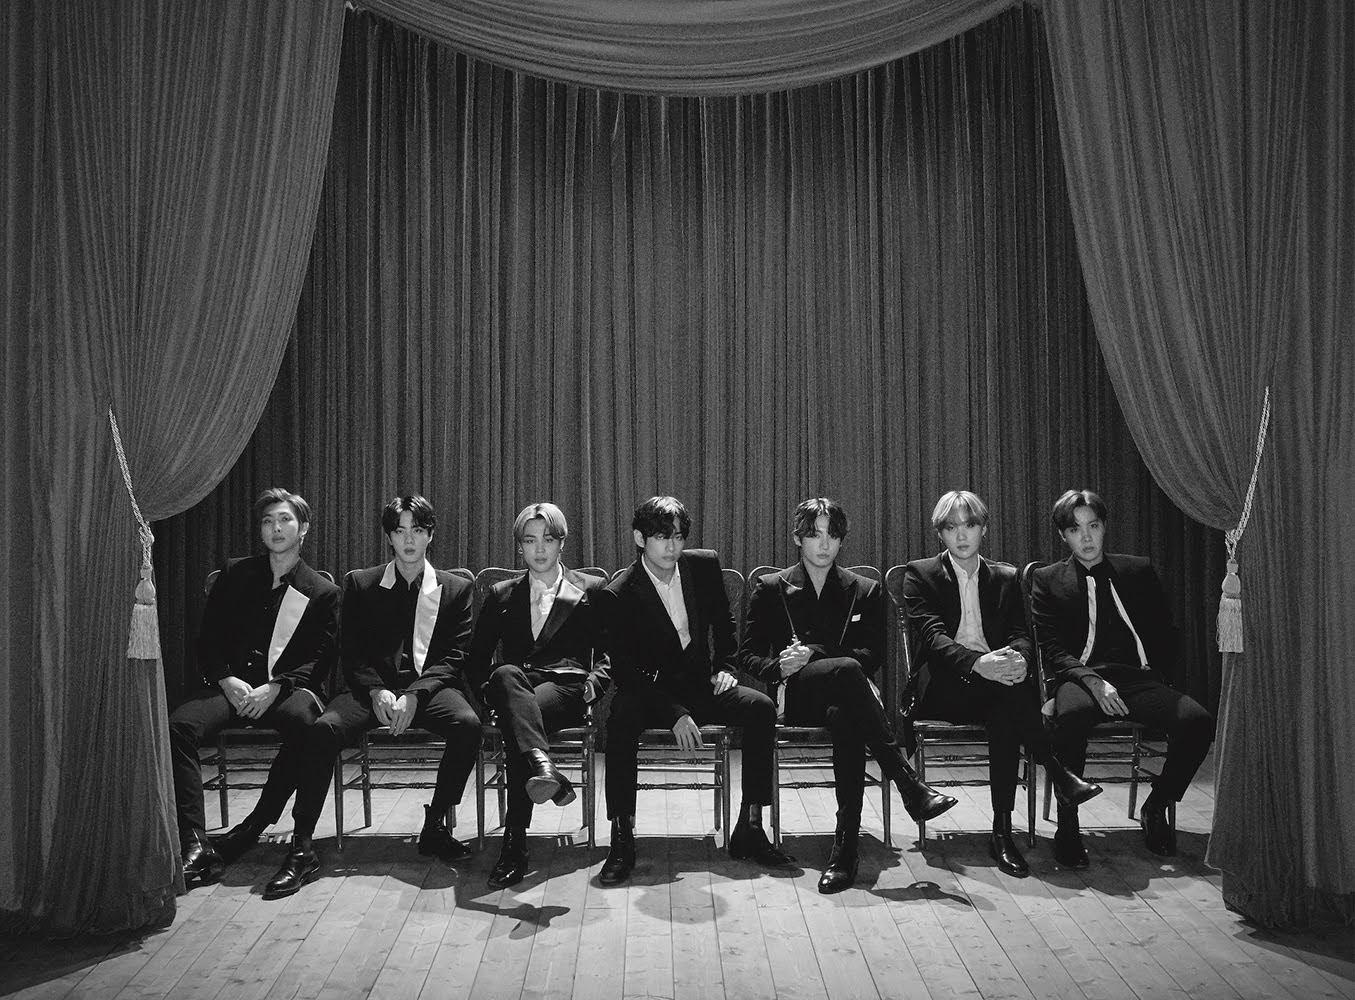 BTS 為日劇「 螺旋的迷宮~DNA科學搜查 ~ 」唱主題曲〈Stay Gold〉 6月19日全球同步問世